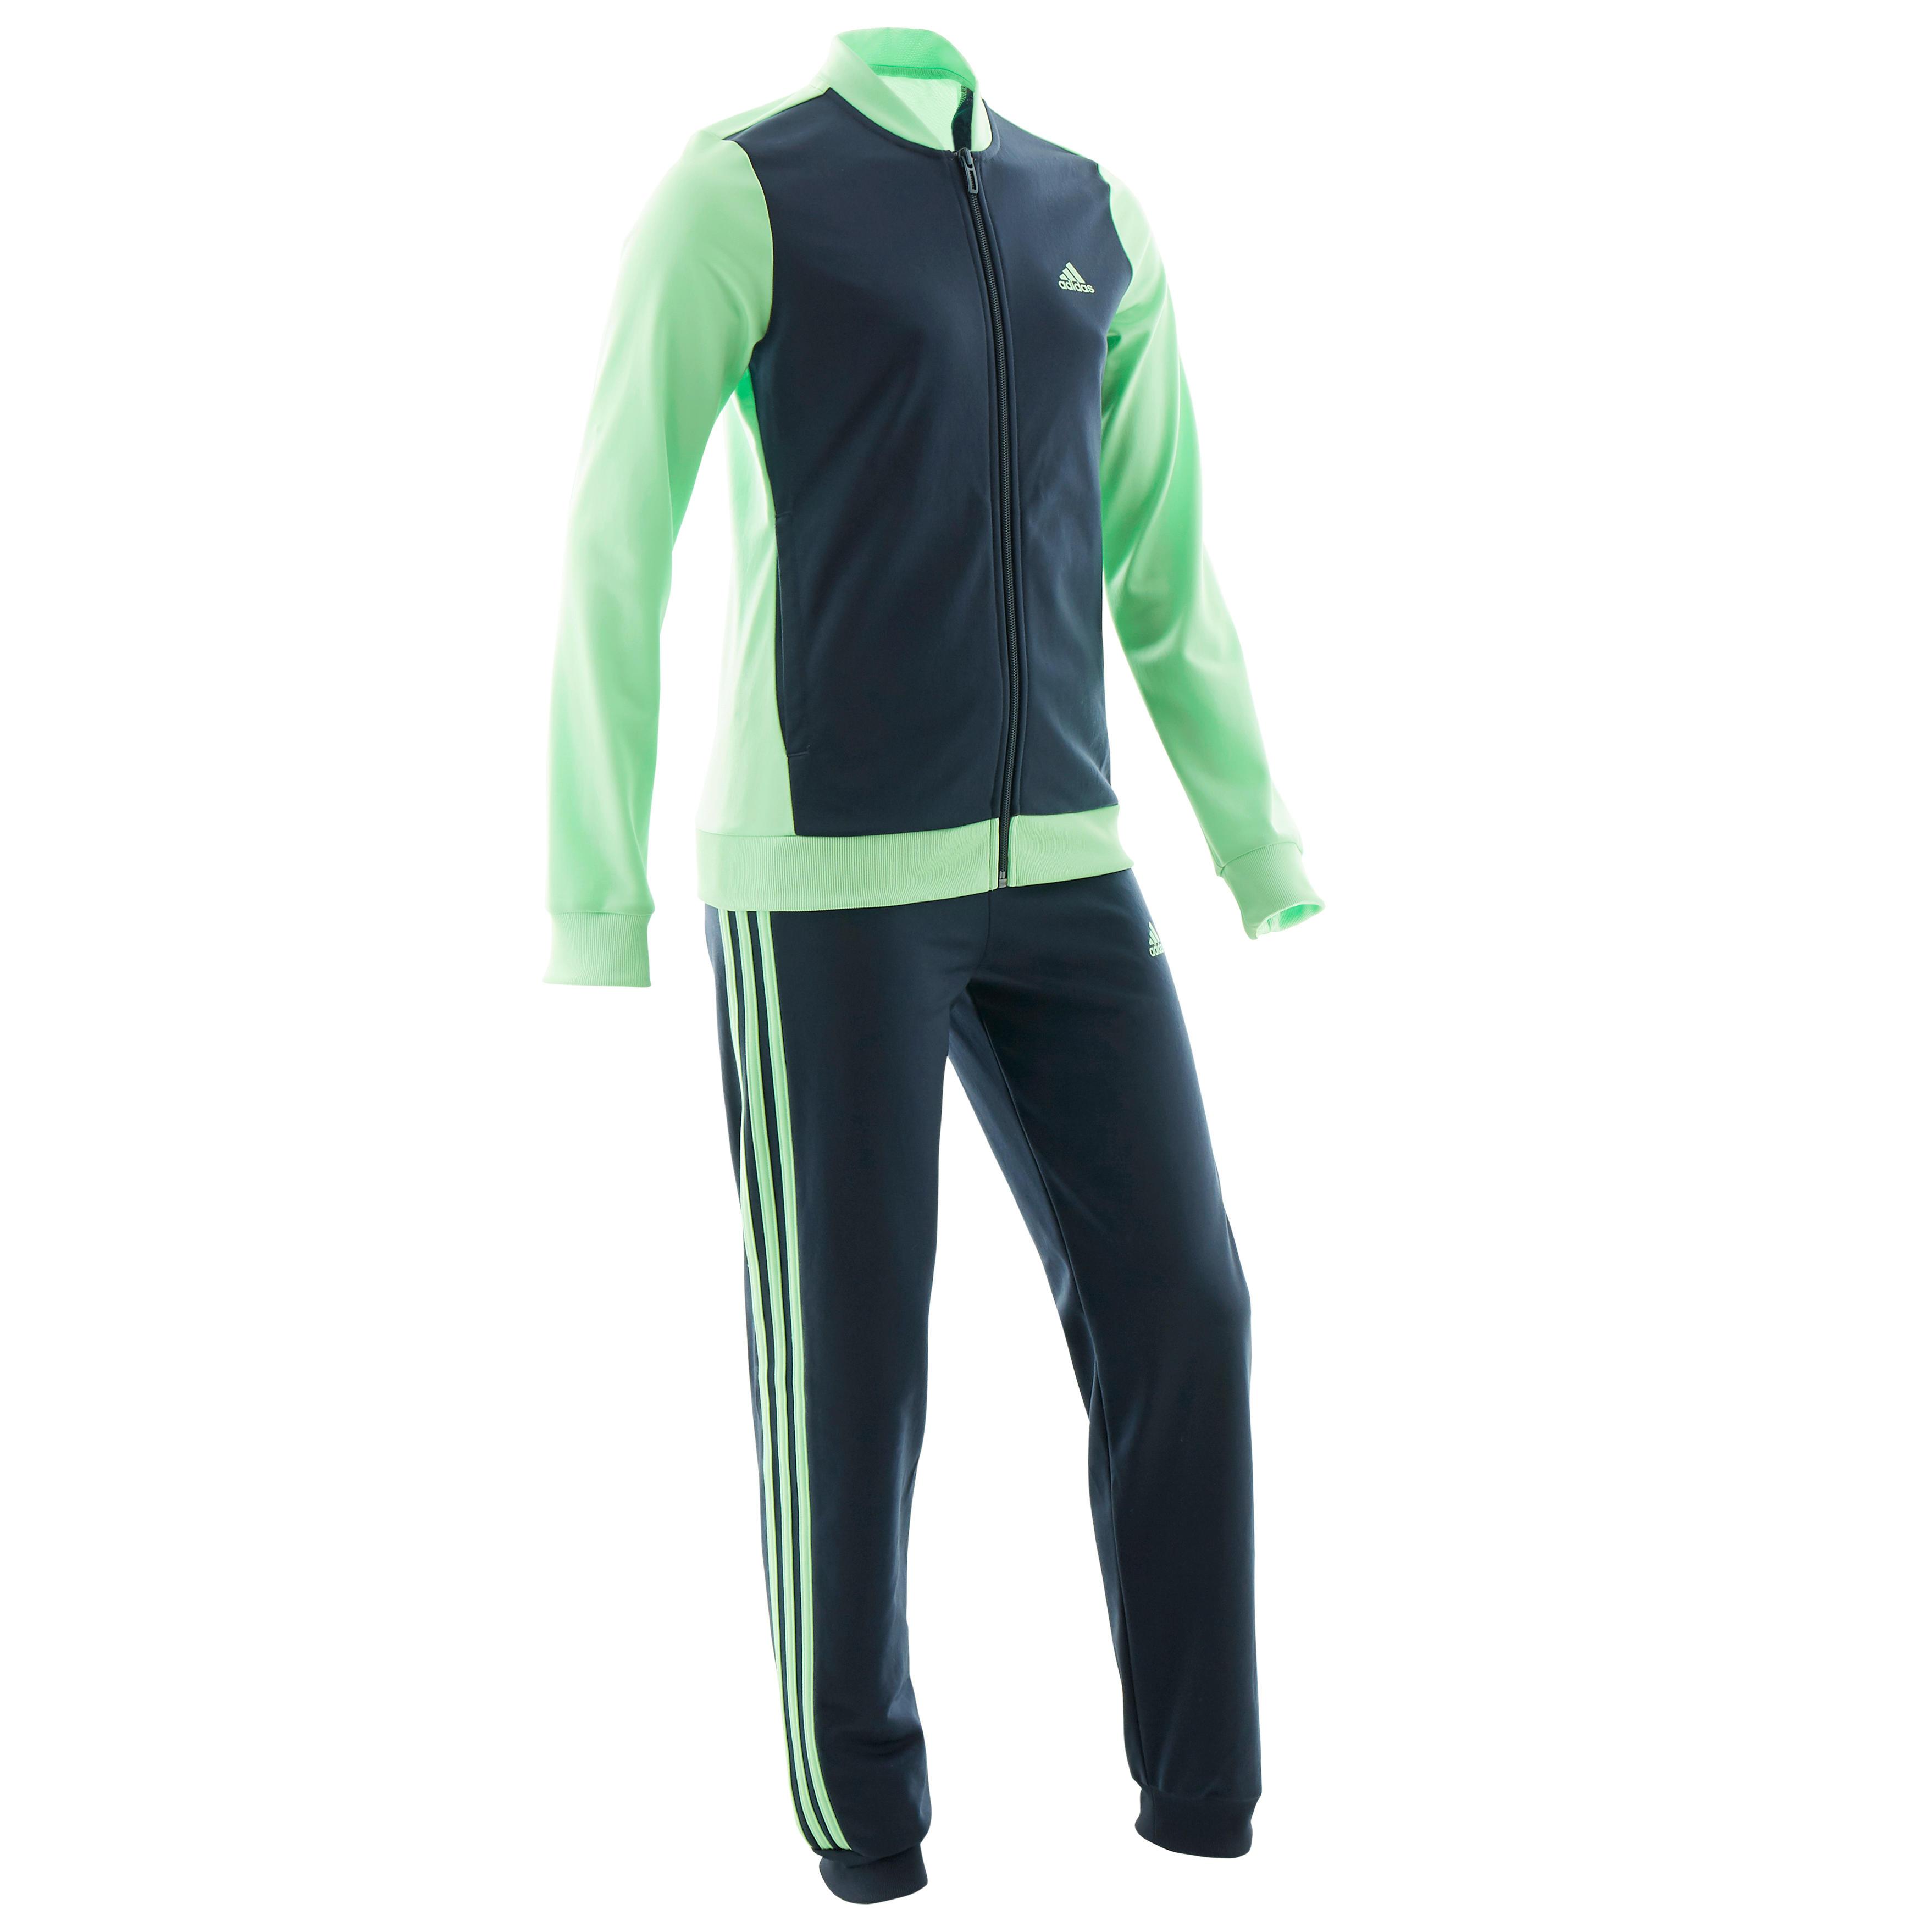 Misericordioso Umeki club  Chándal niño niña Adidas gimnasia deportiva verde azul marino ADIDAS |  Decathlon